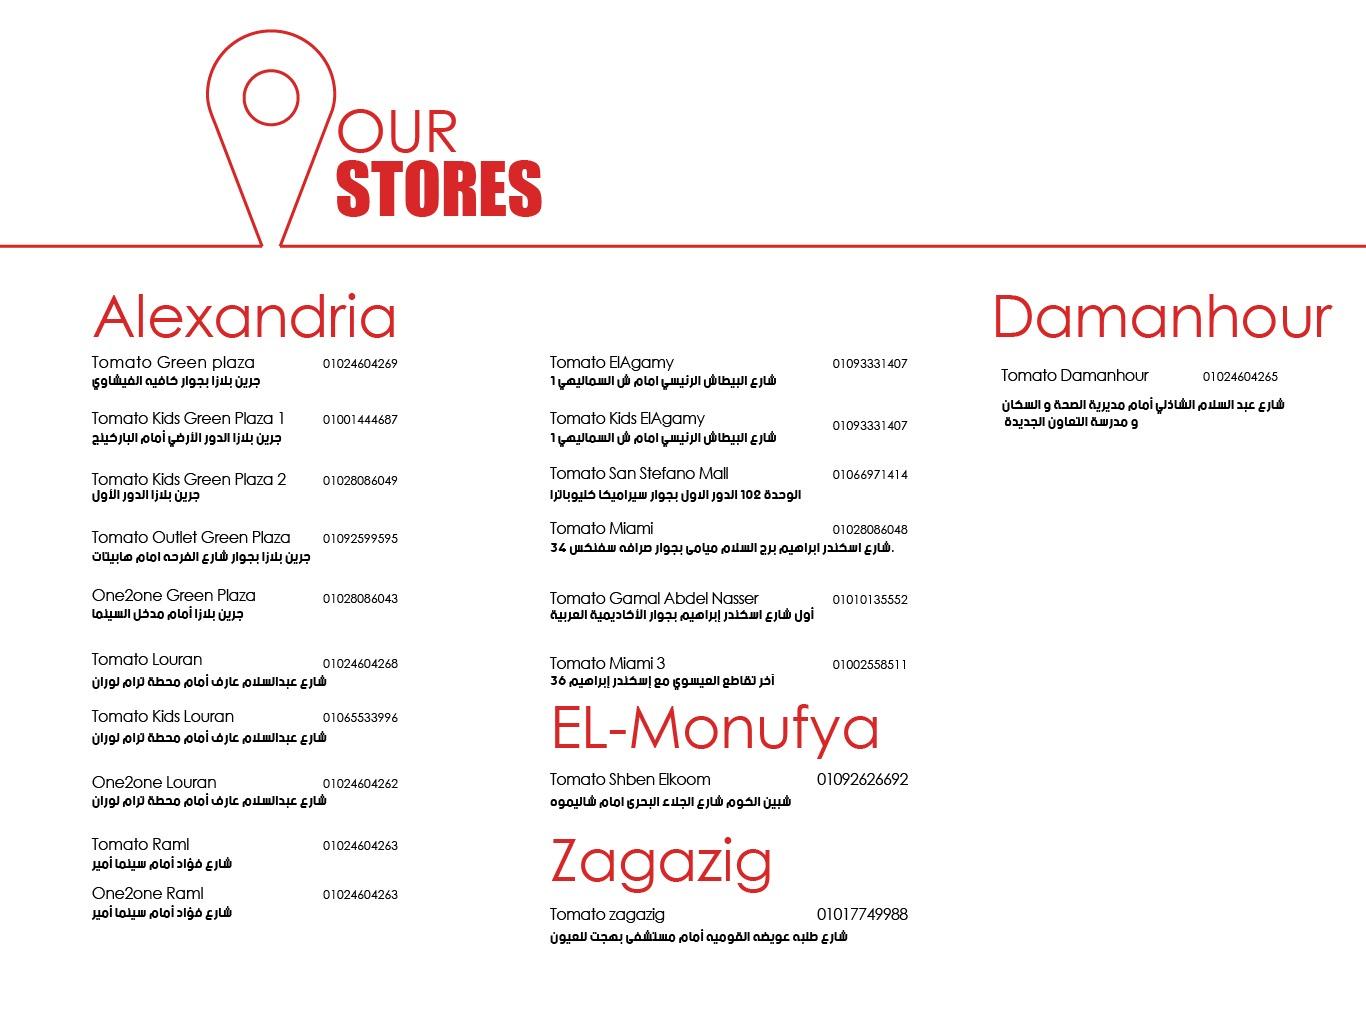 Tomato stores locations